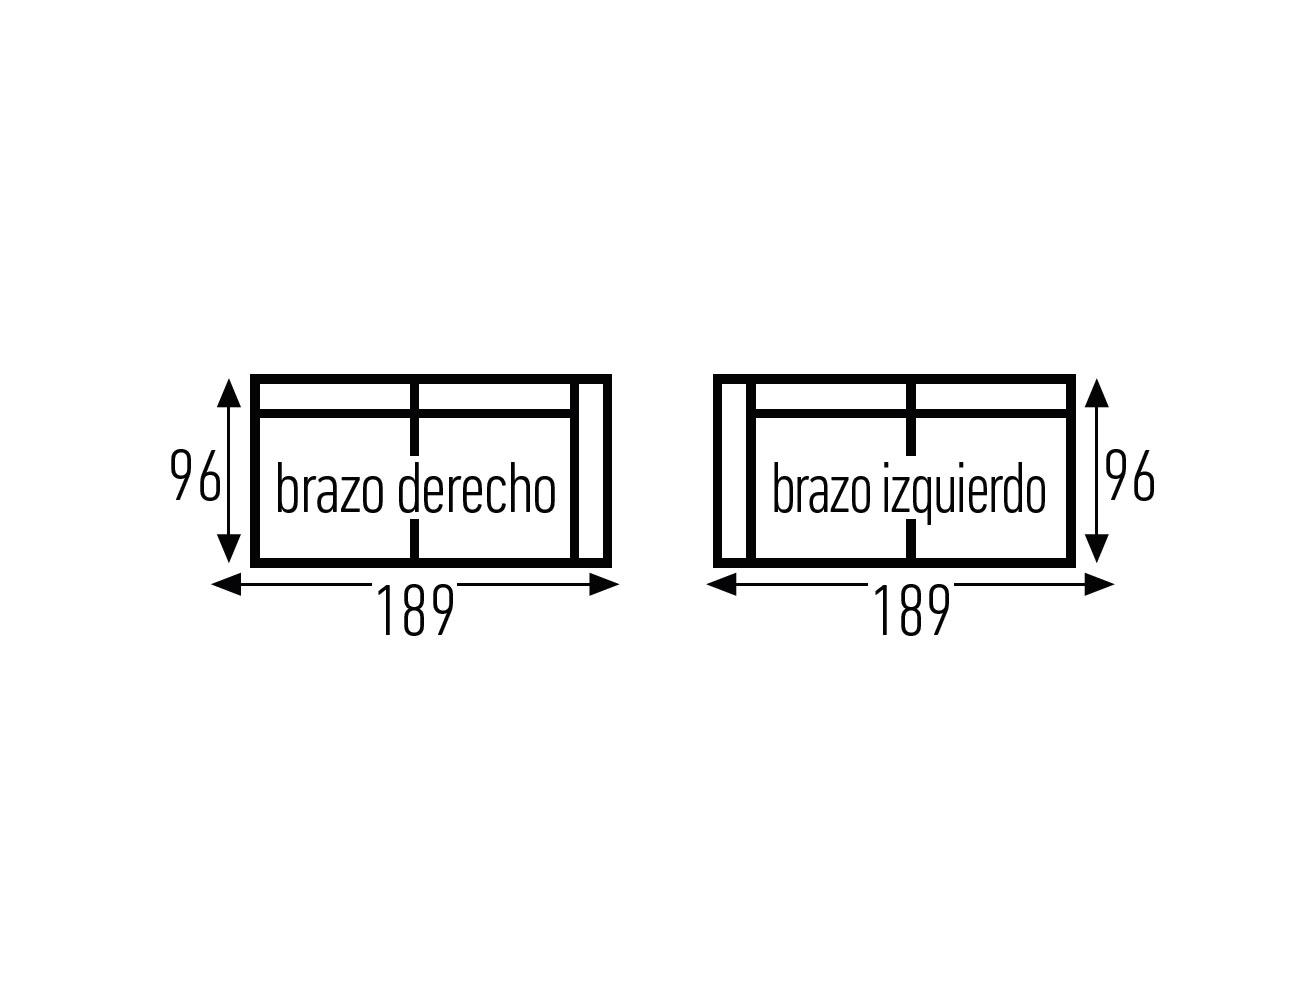 Croquis 3p sin 1 brazo 18910